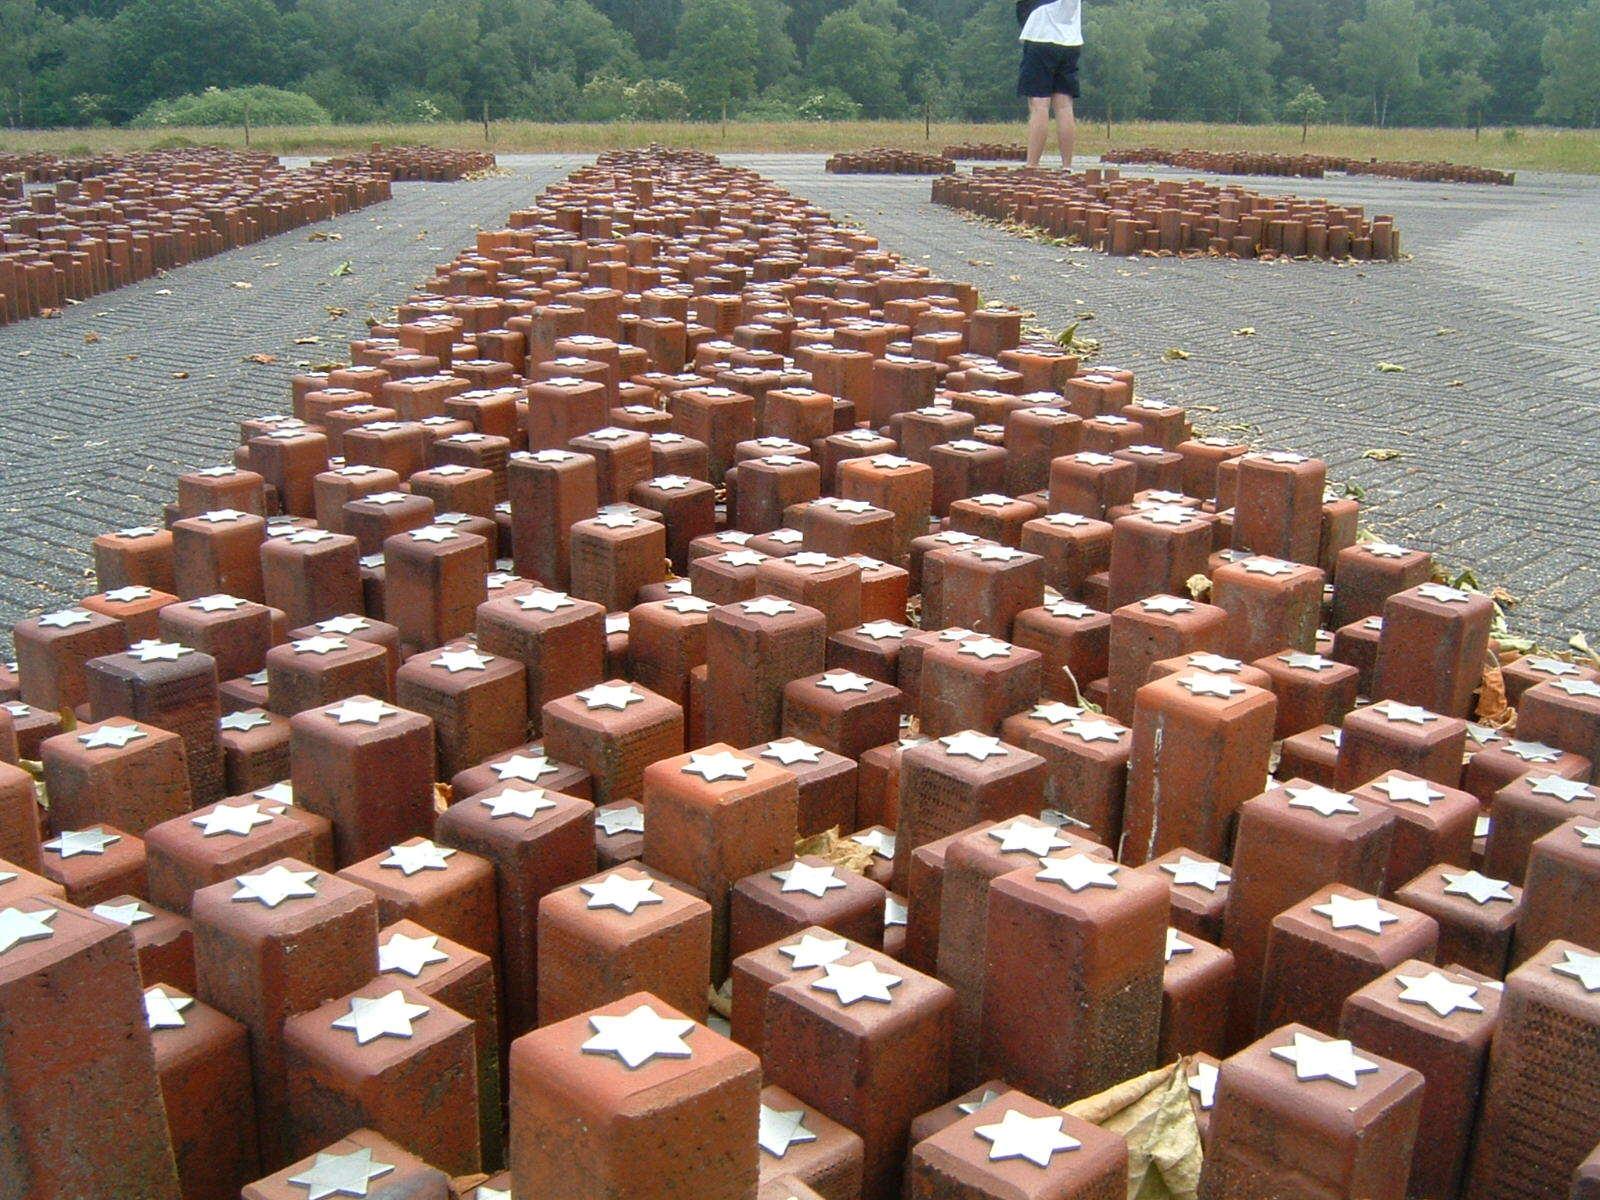 Westerbork monument1 c Blacknight